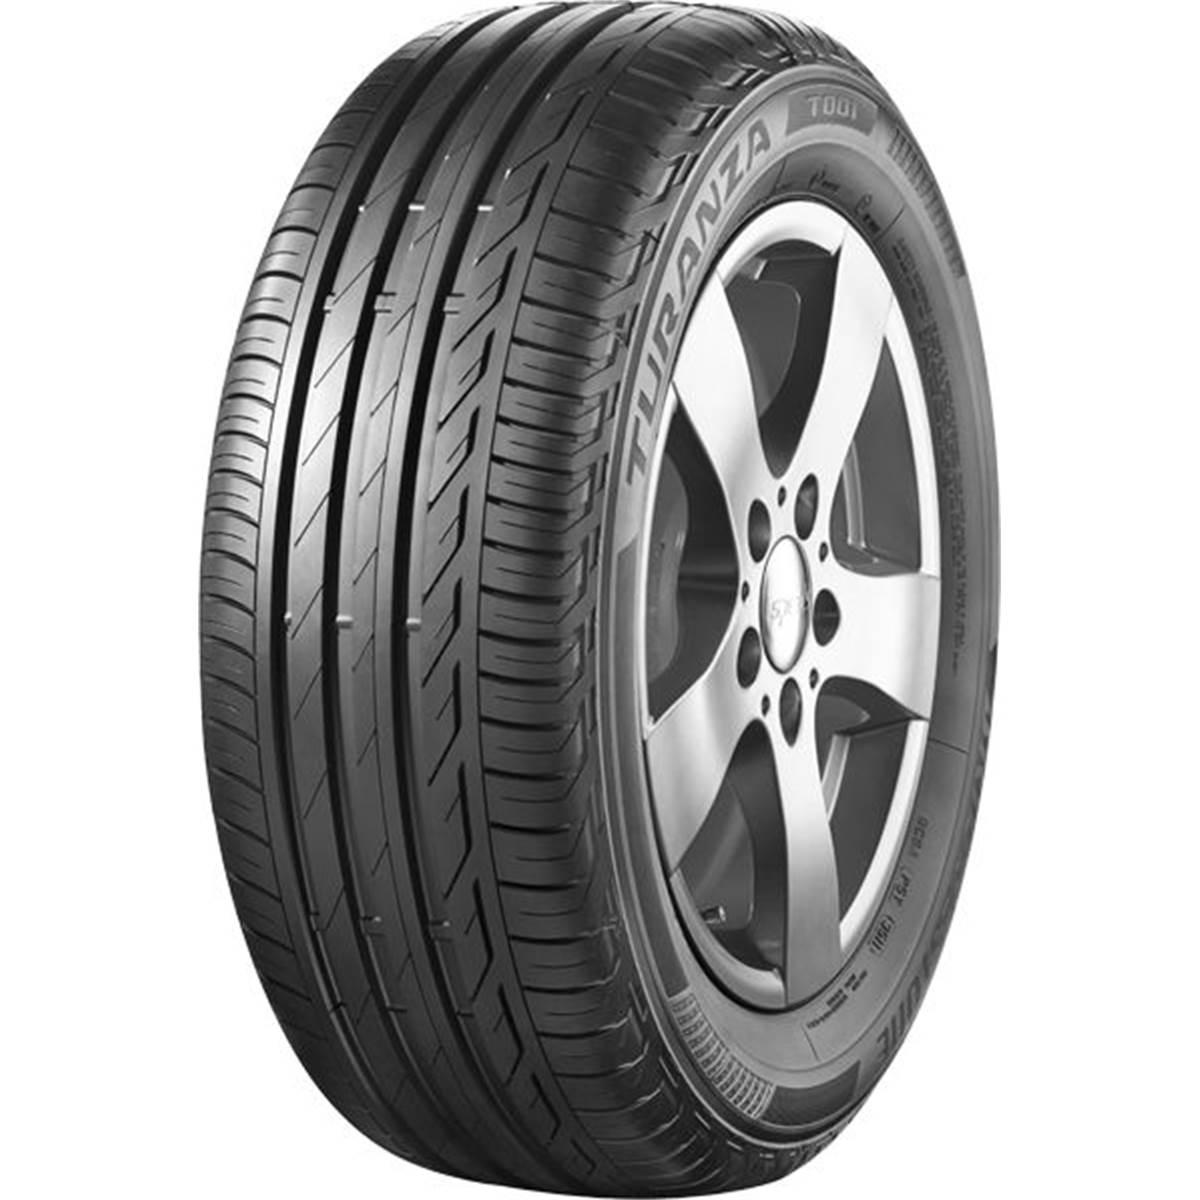 Pneu Bridgestone 185/65R15 88H Turanza T001